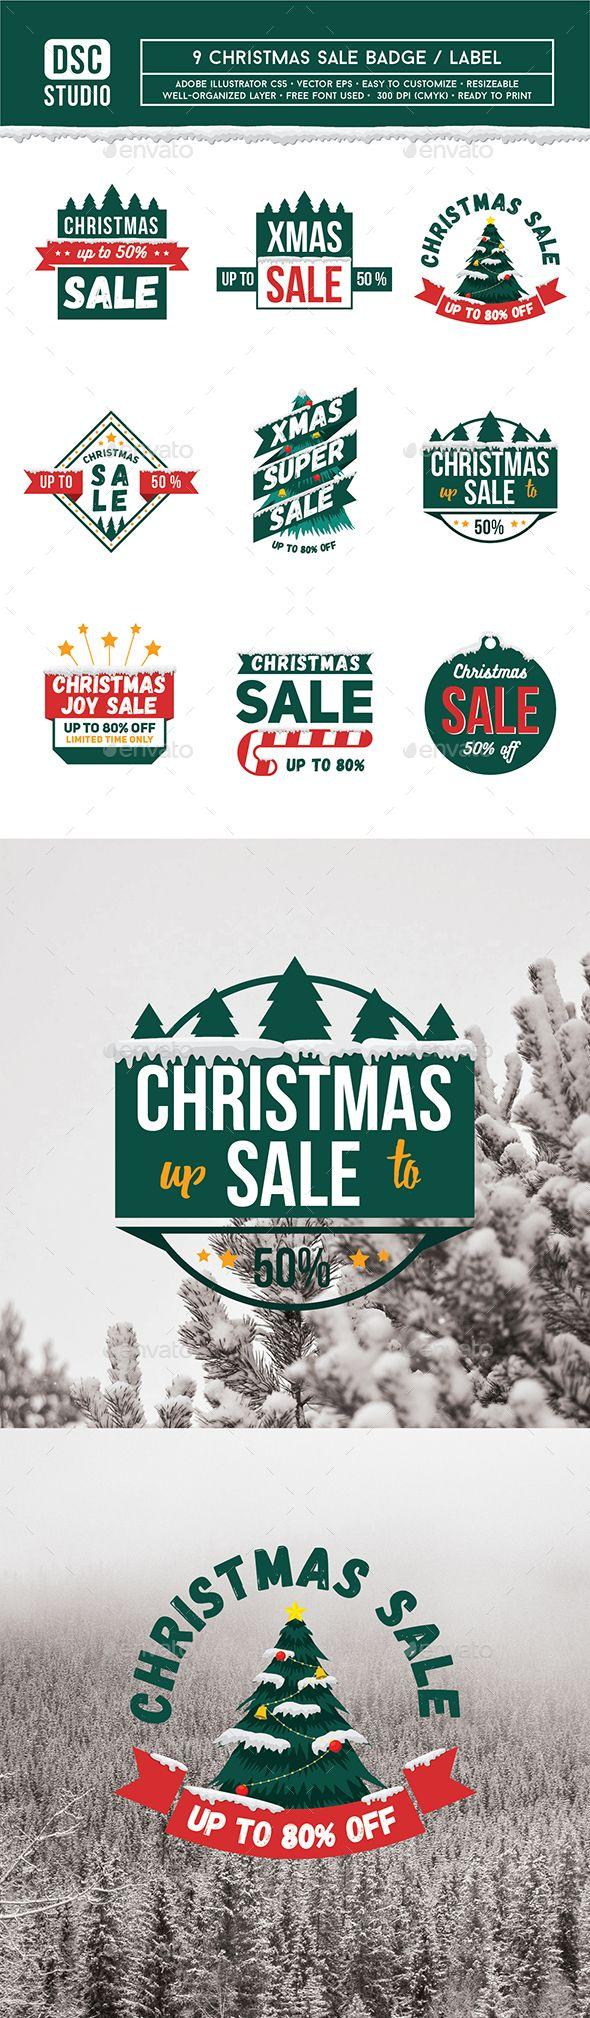 9 Christmas Sale Badge / Label   Ai illustrator, Label templates ...